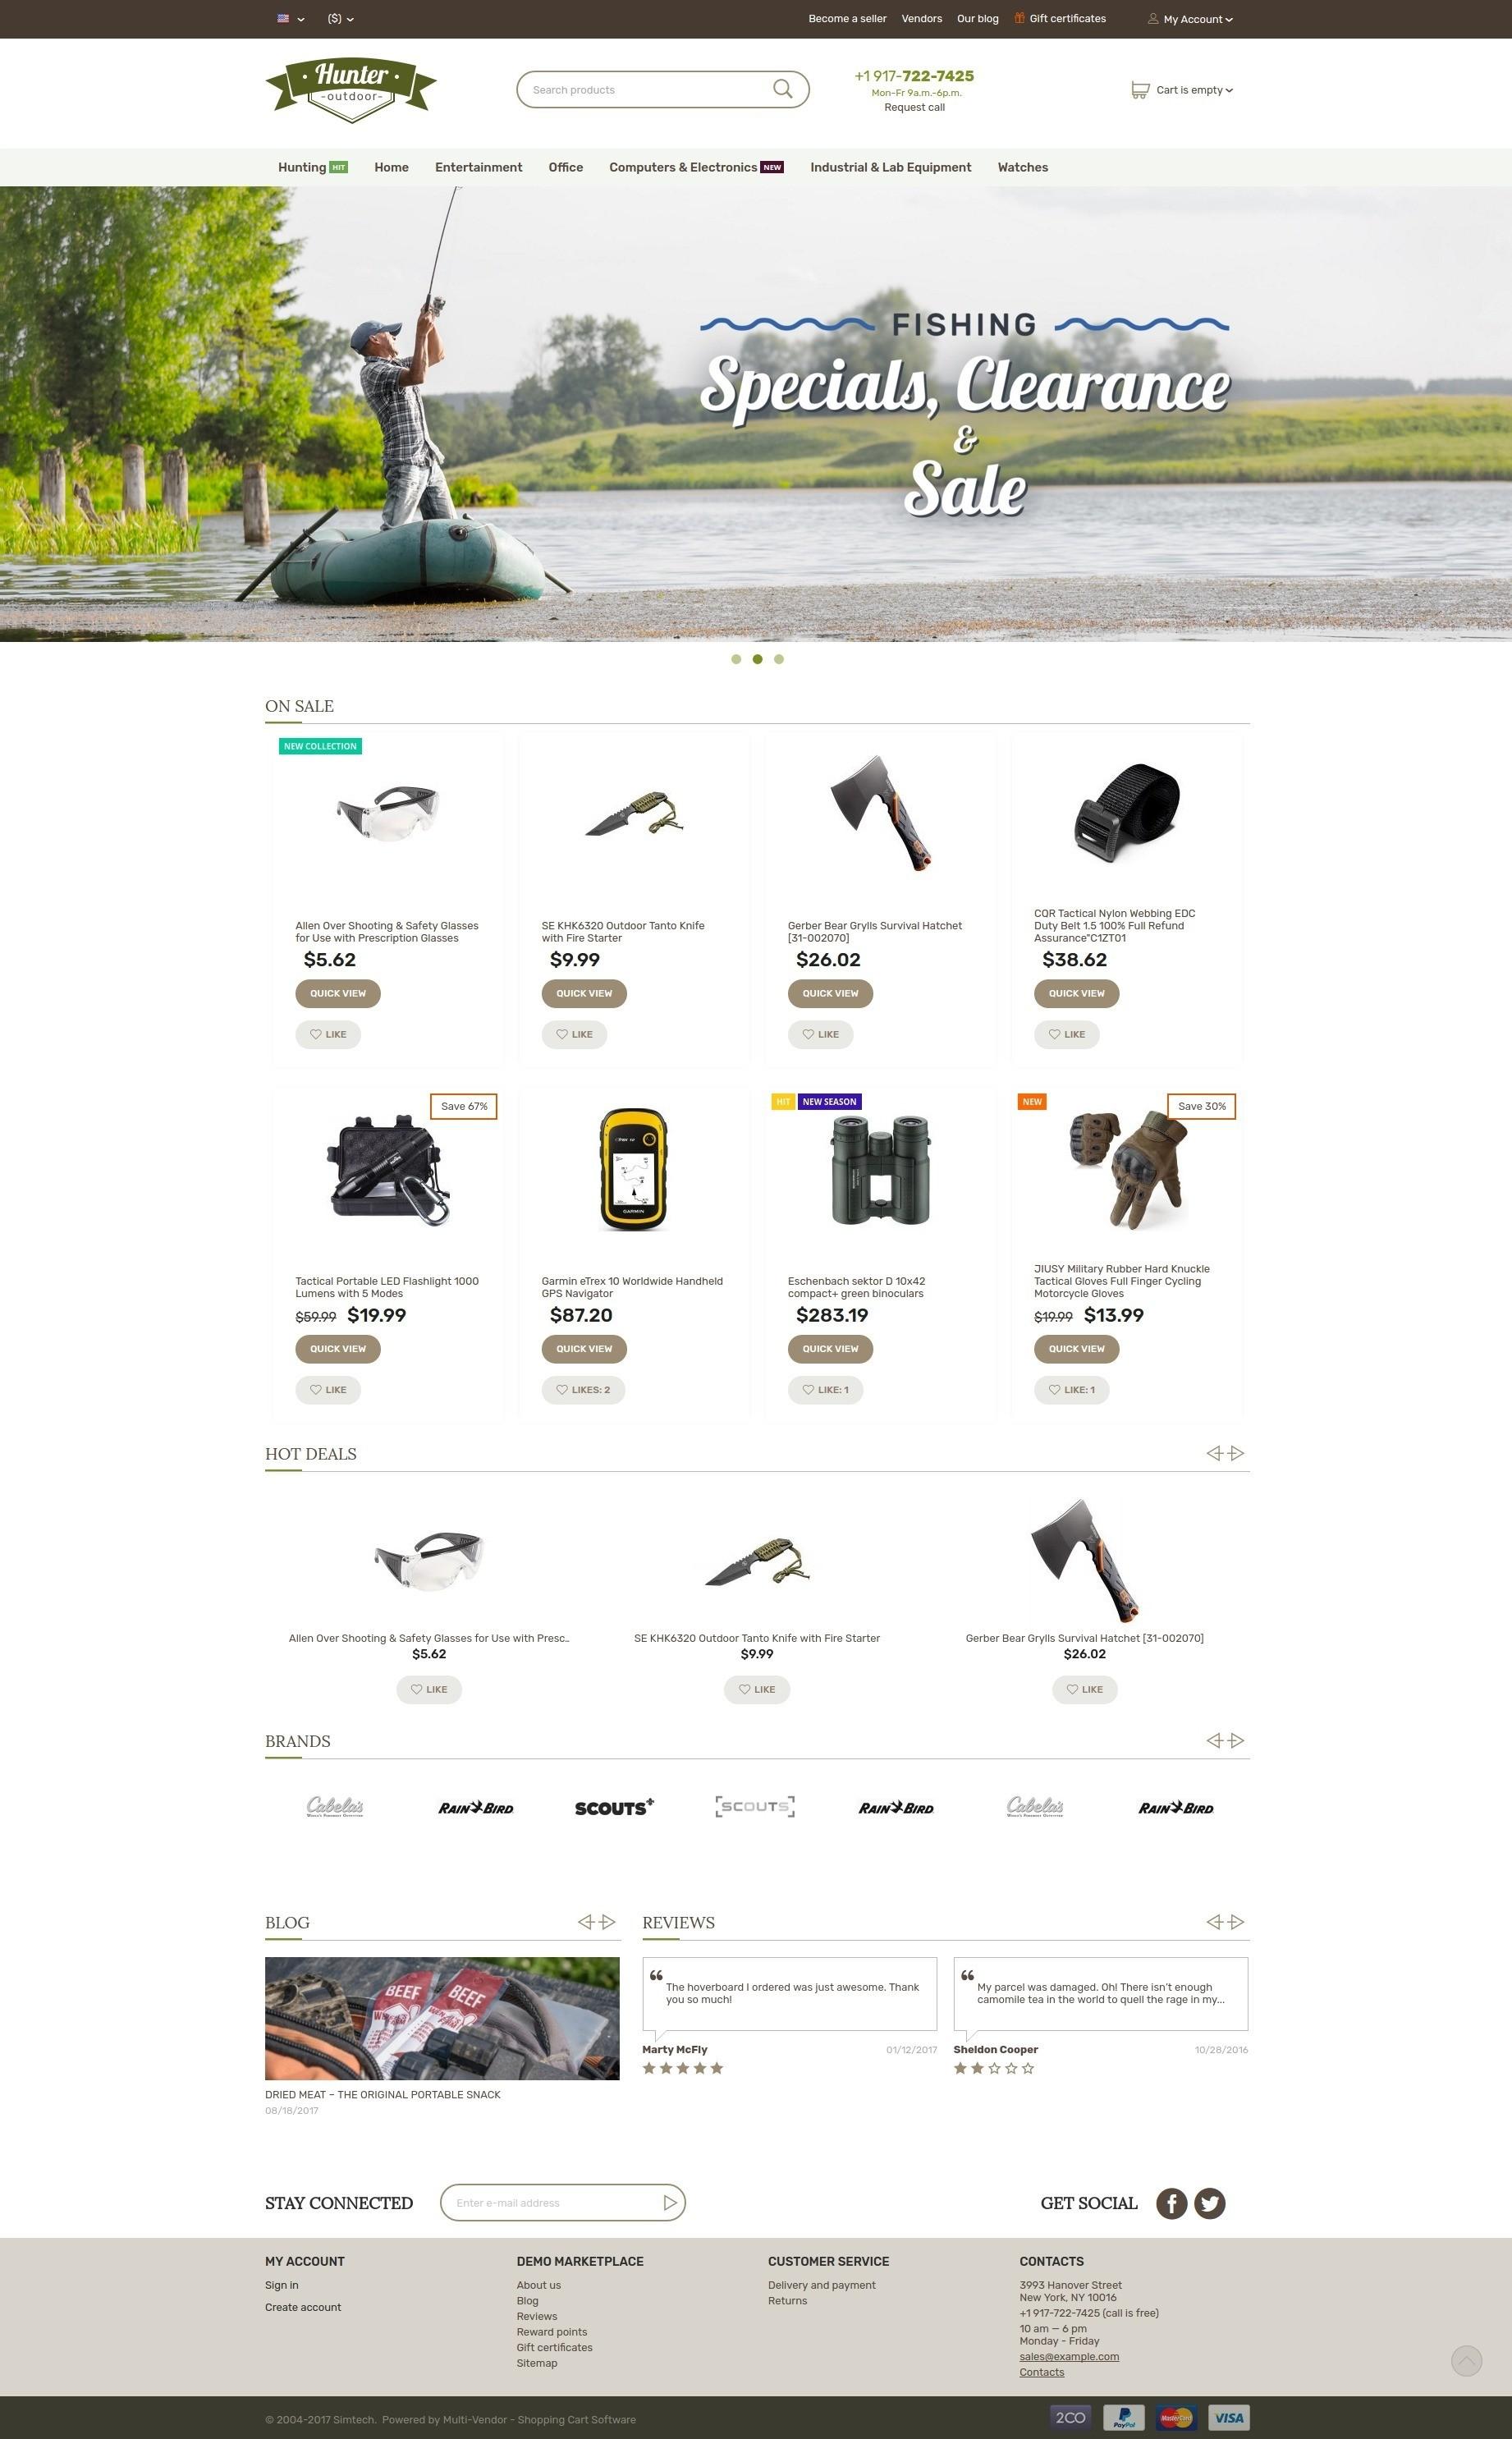 hunter-theme-homepage.jpg?1511973225757